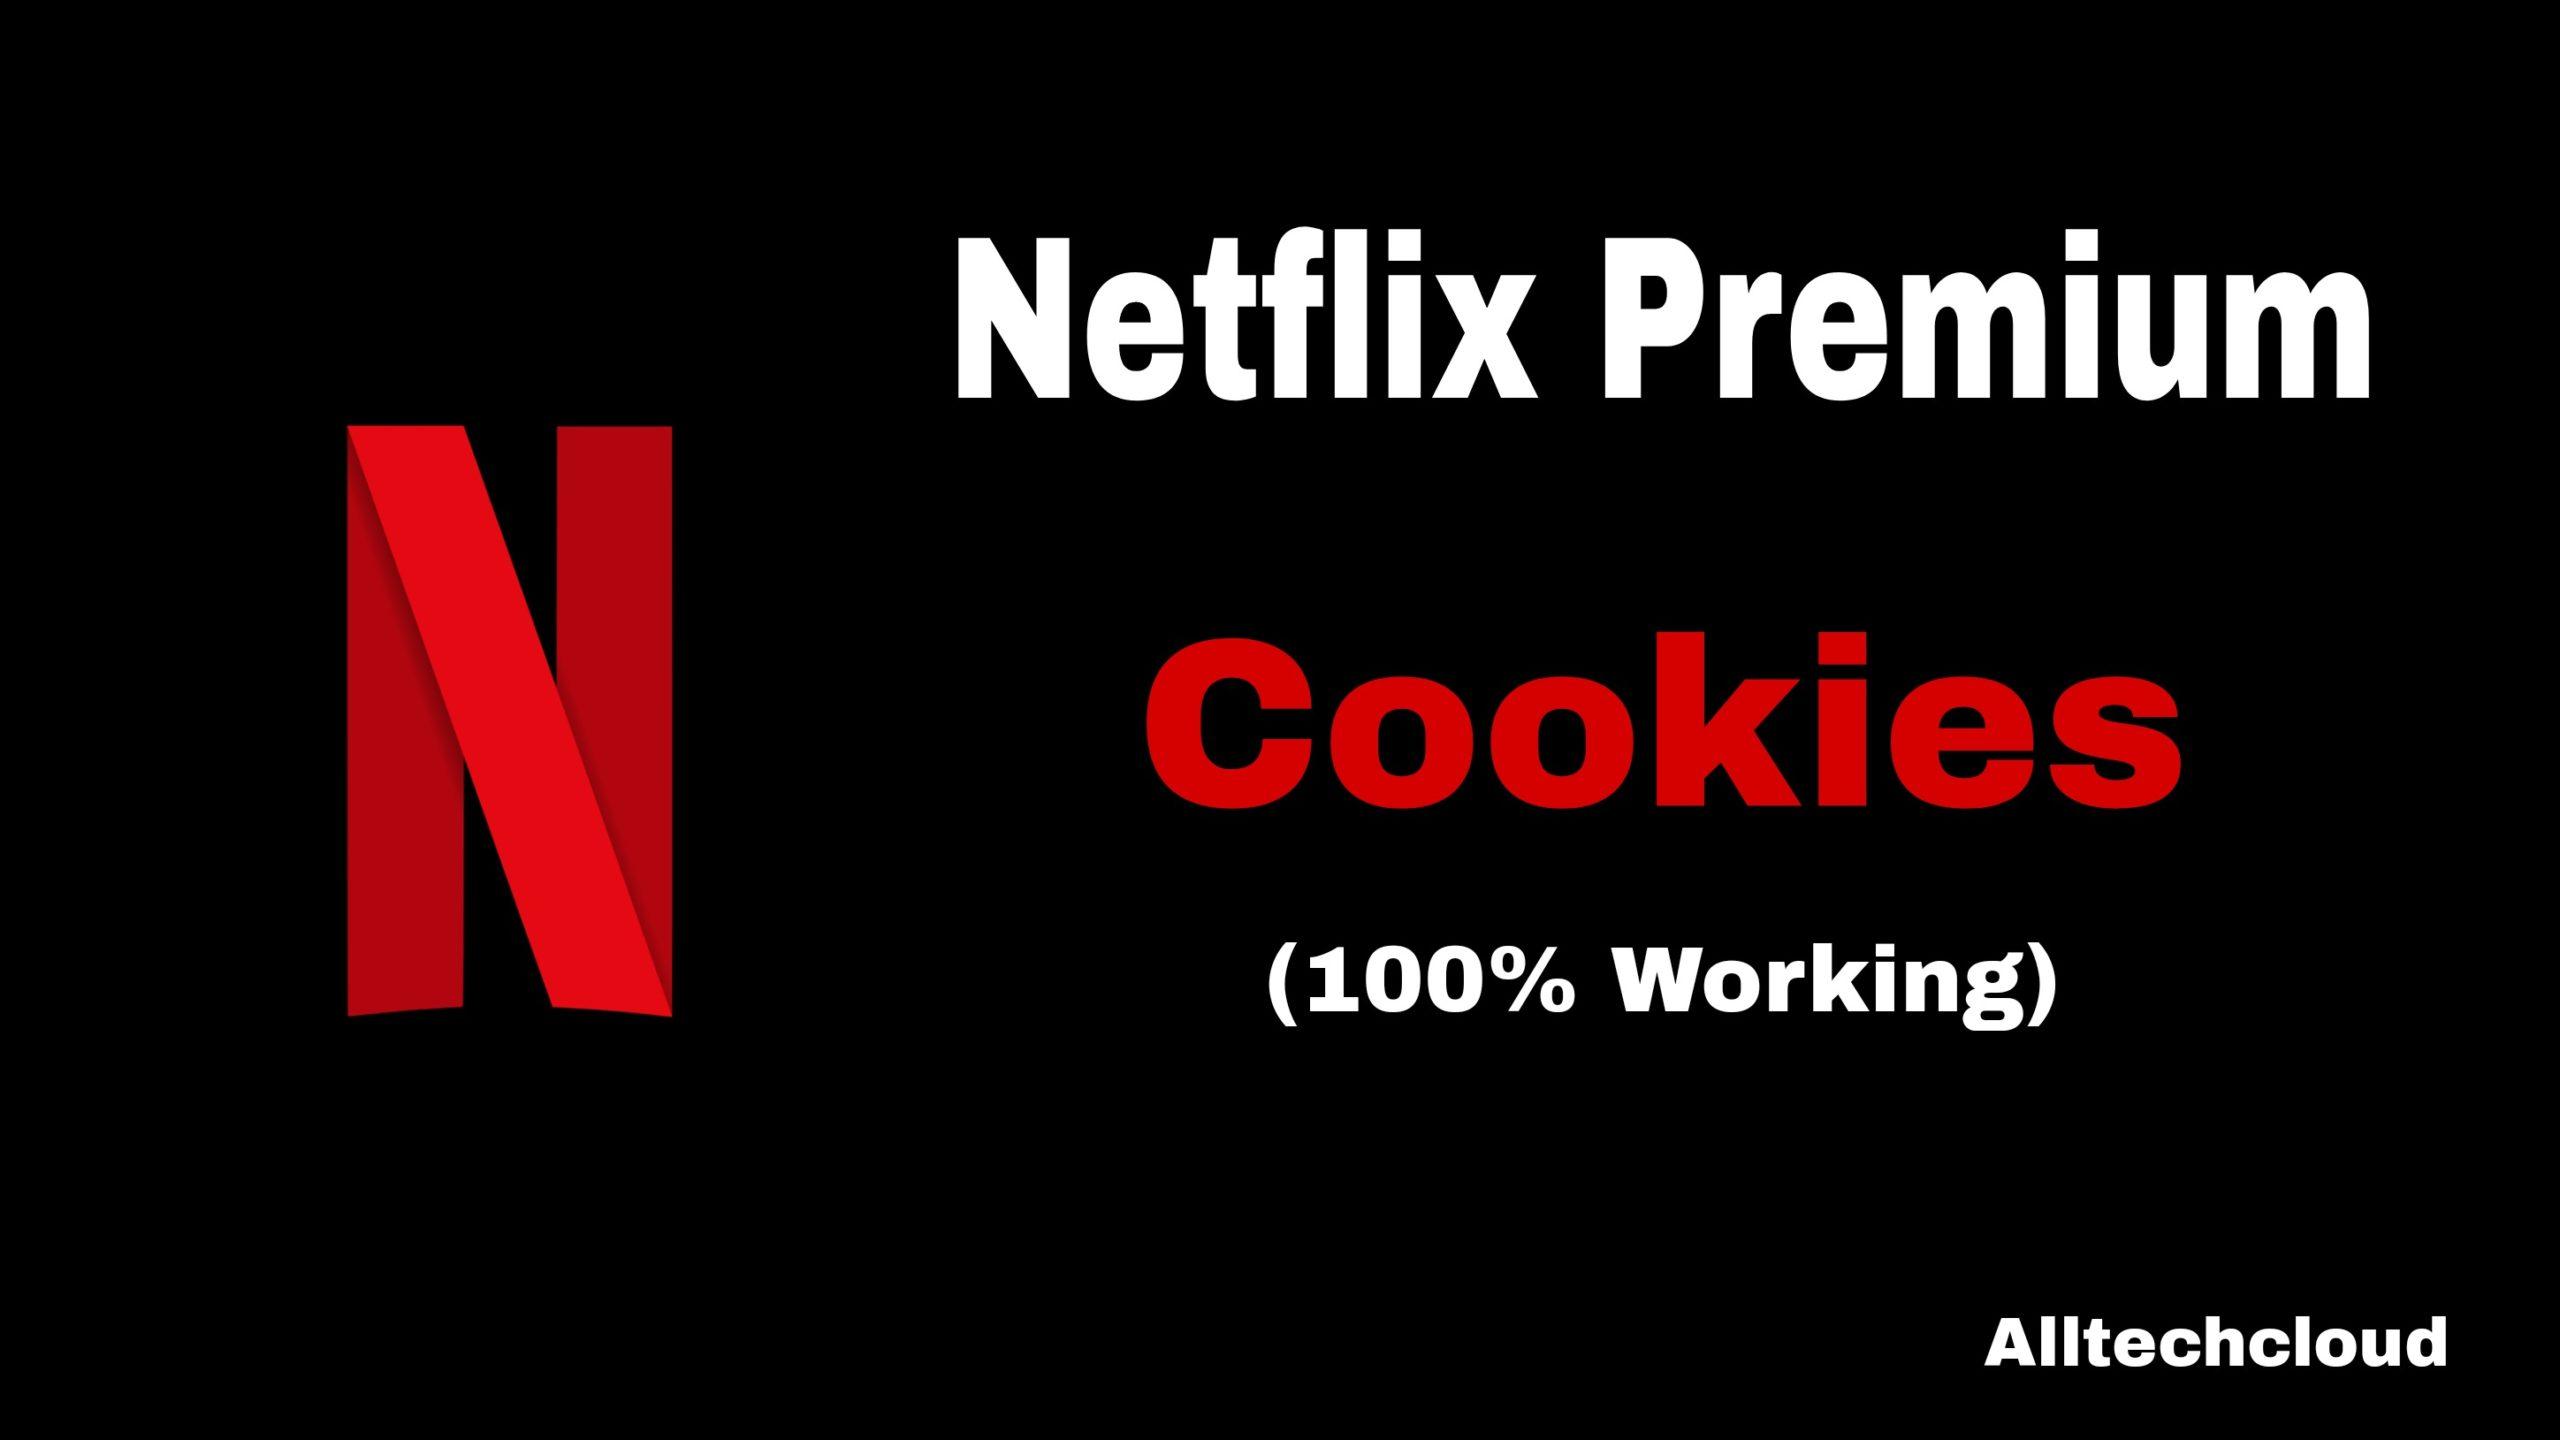 Netflix Cookies Premium Accounts Free [July 2021 & Hourly Update]